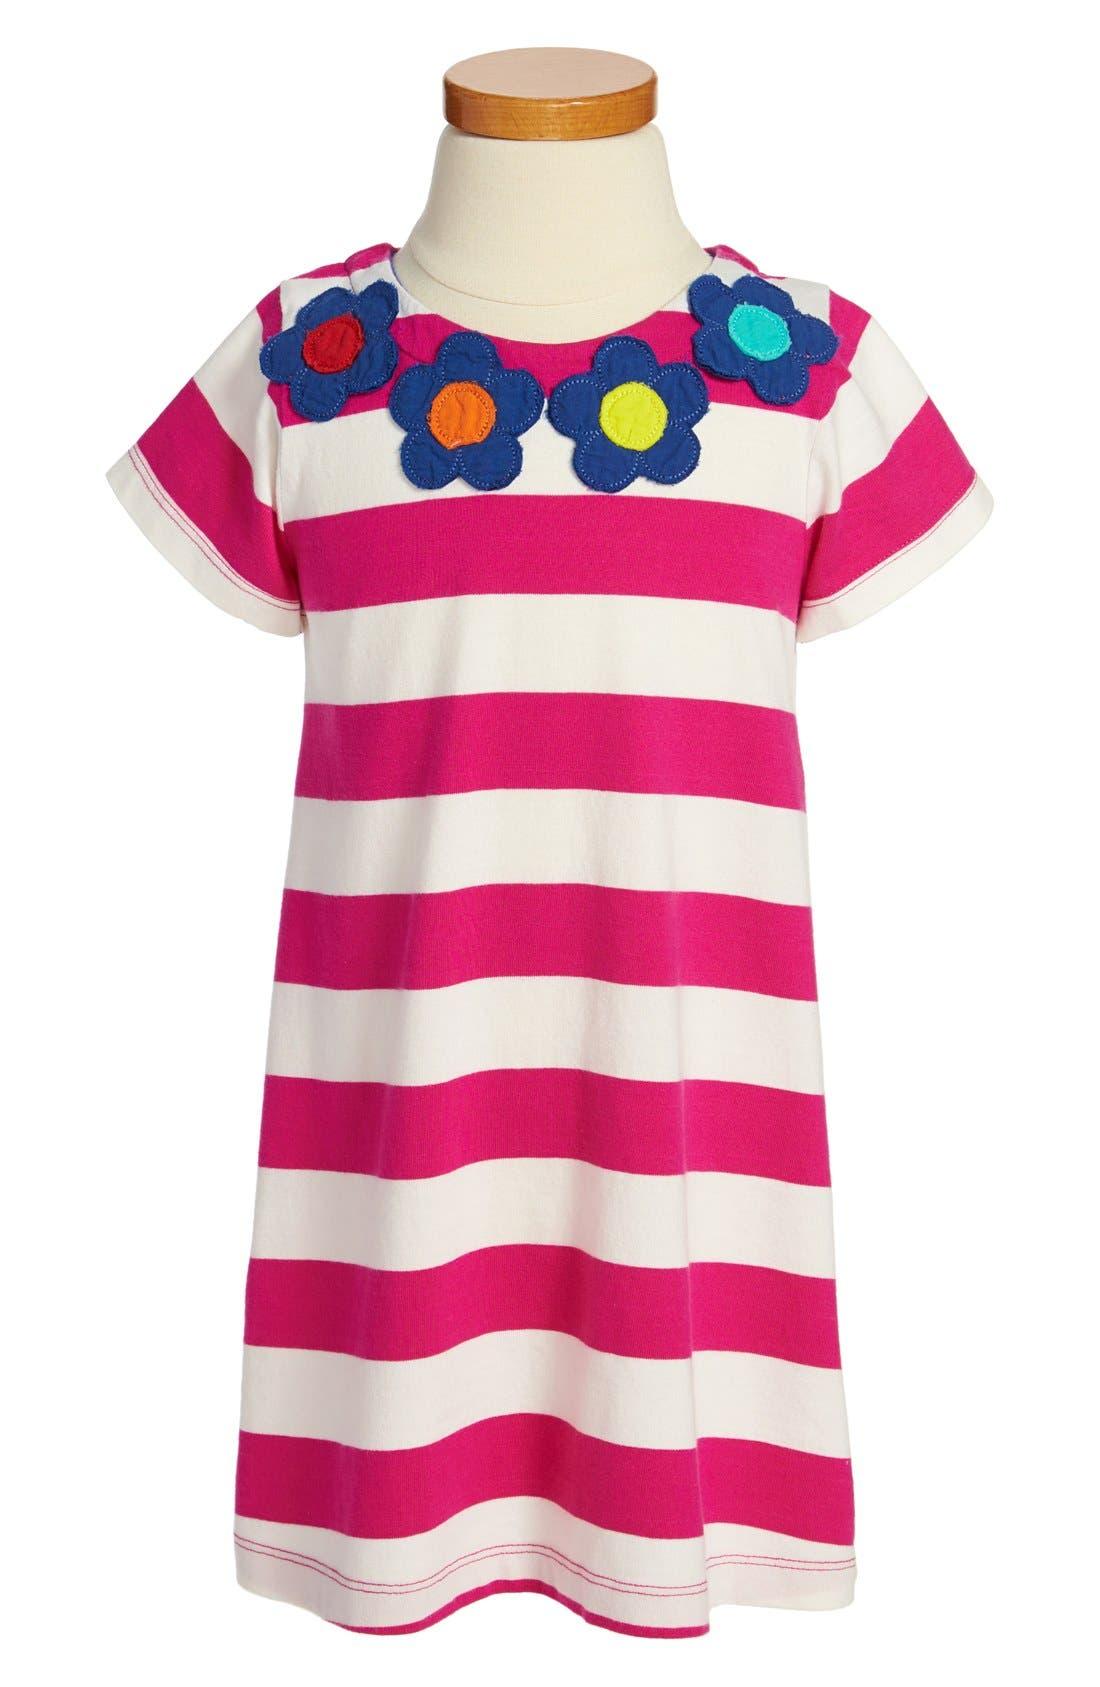 Alternate Image 1 Selected - Mini Boden Appliqué Cotton Dress (Toddler Girls, Little Girls & Big Girls)